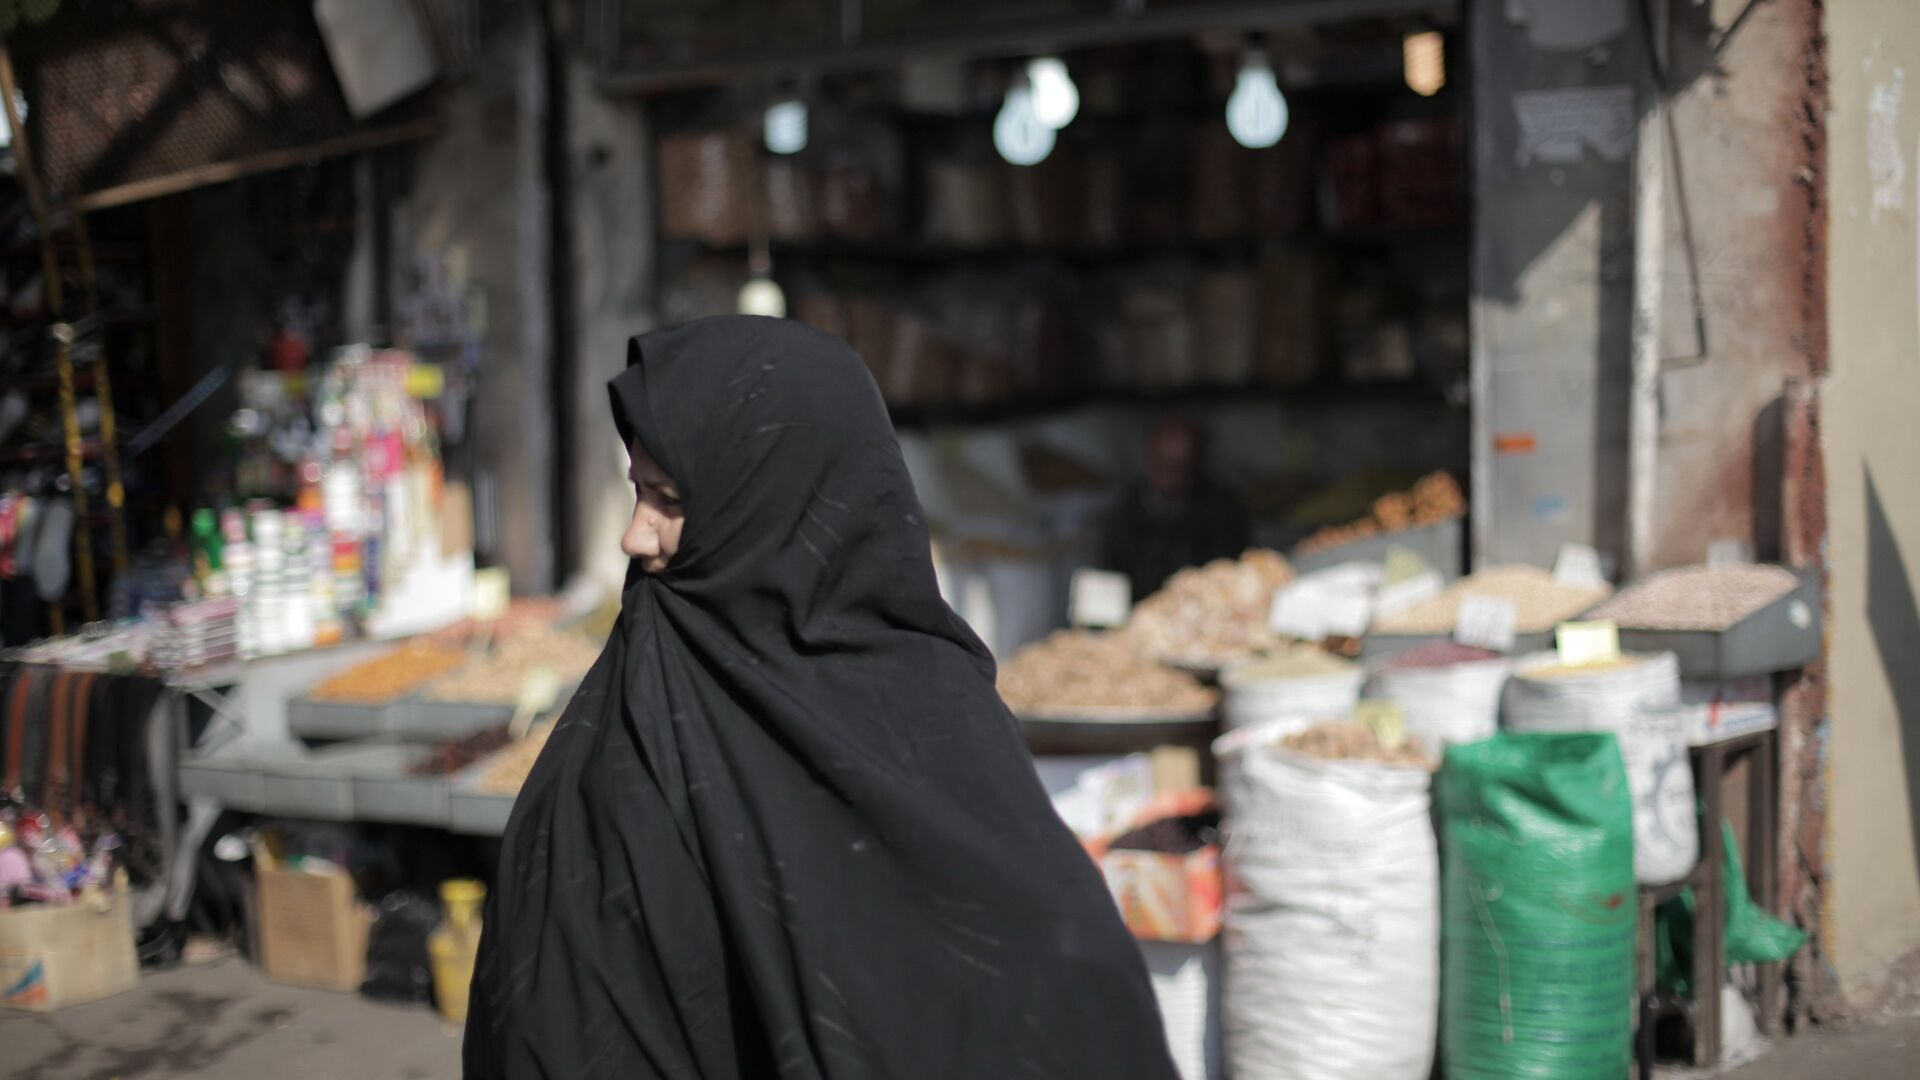 Женщина на рынке в Тегеране. Иран.  - РИА Новости, 1920, 27.02.2021